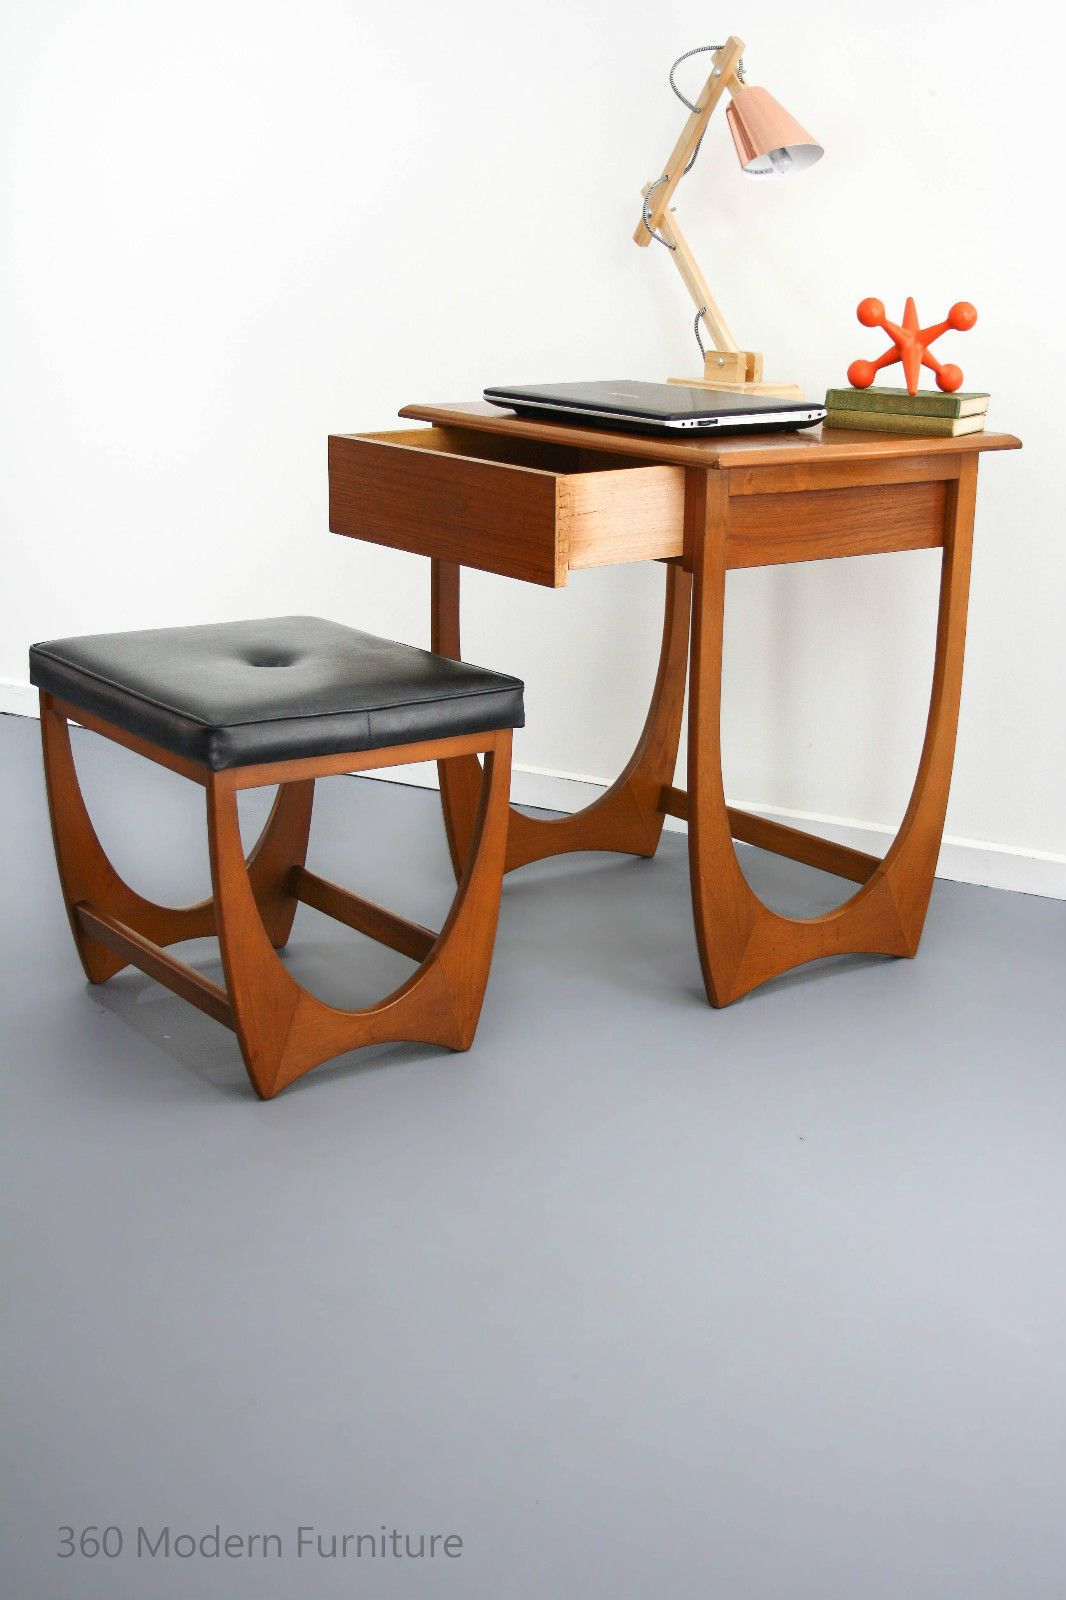 Mid Century Modern Desk Hall Table Drawer Console Stool Vintage Retro Scandi Mid Century Modern Furniture Mid Century Modern Decor Mid Century Decor [ 1600 x 1066 Pixel ]